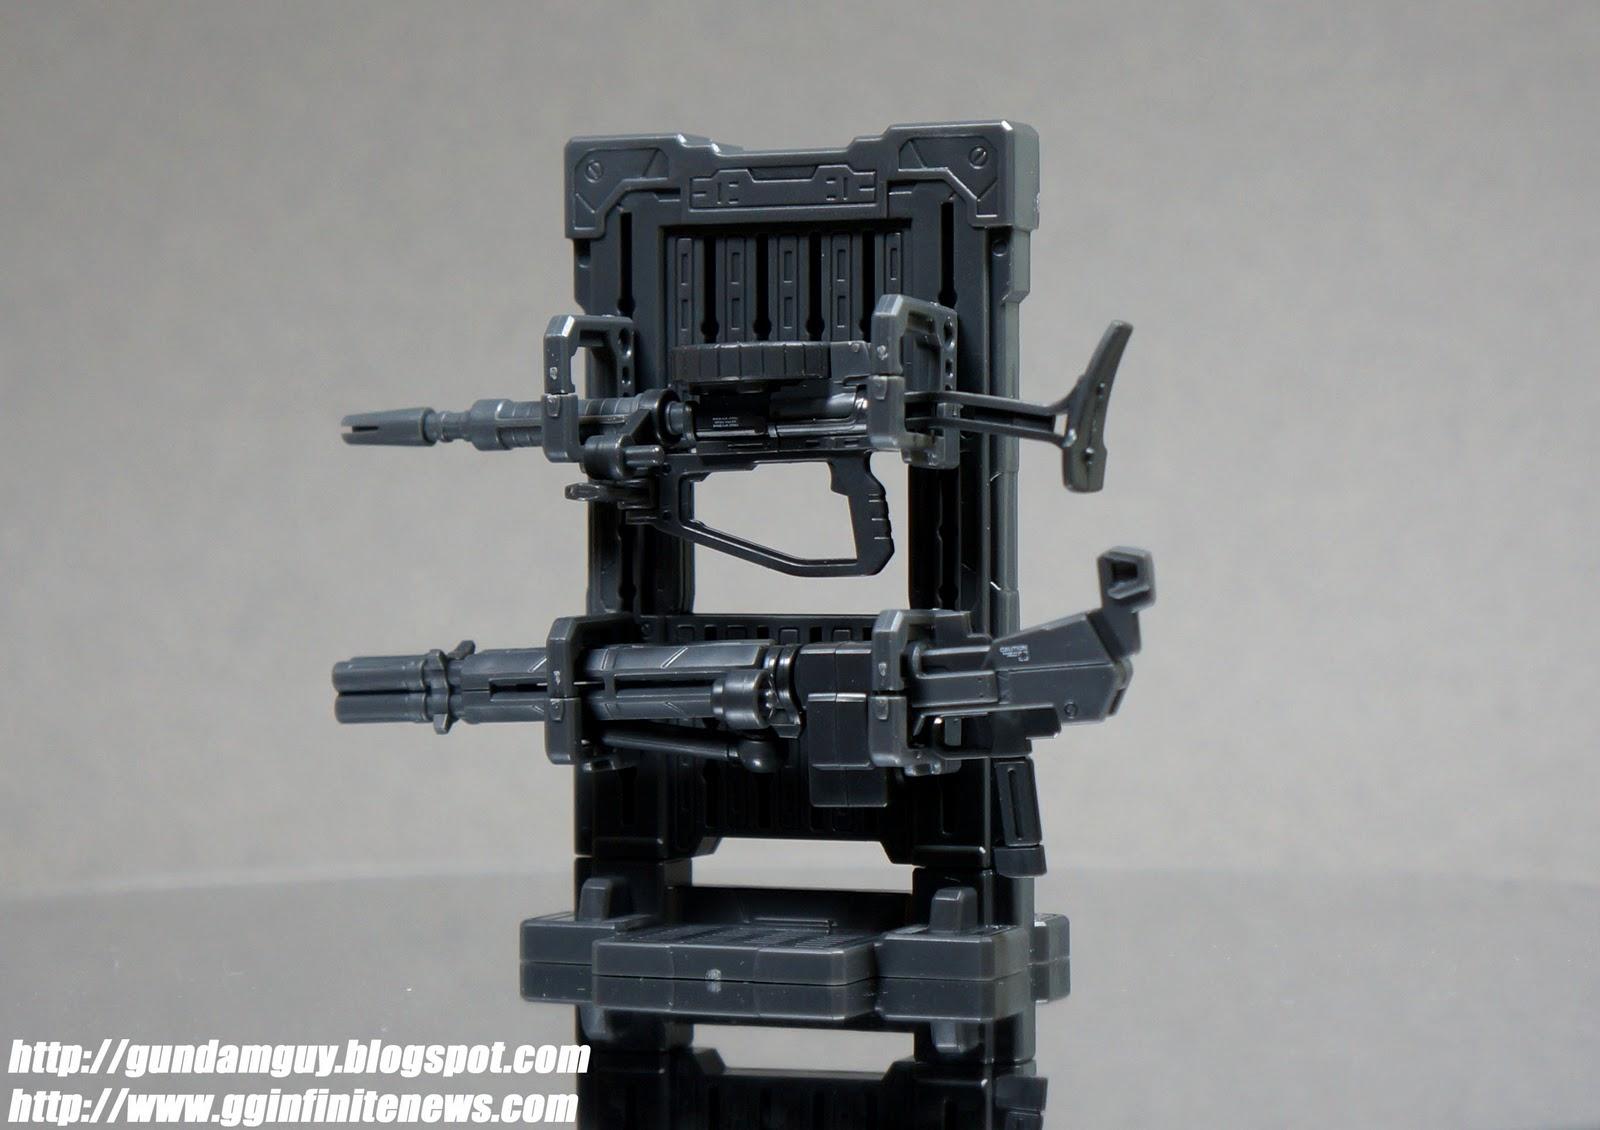 GUNDAM BUILDERS PARTS : 1/144 System Weapon 007 - HYPETOKYO